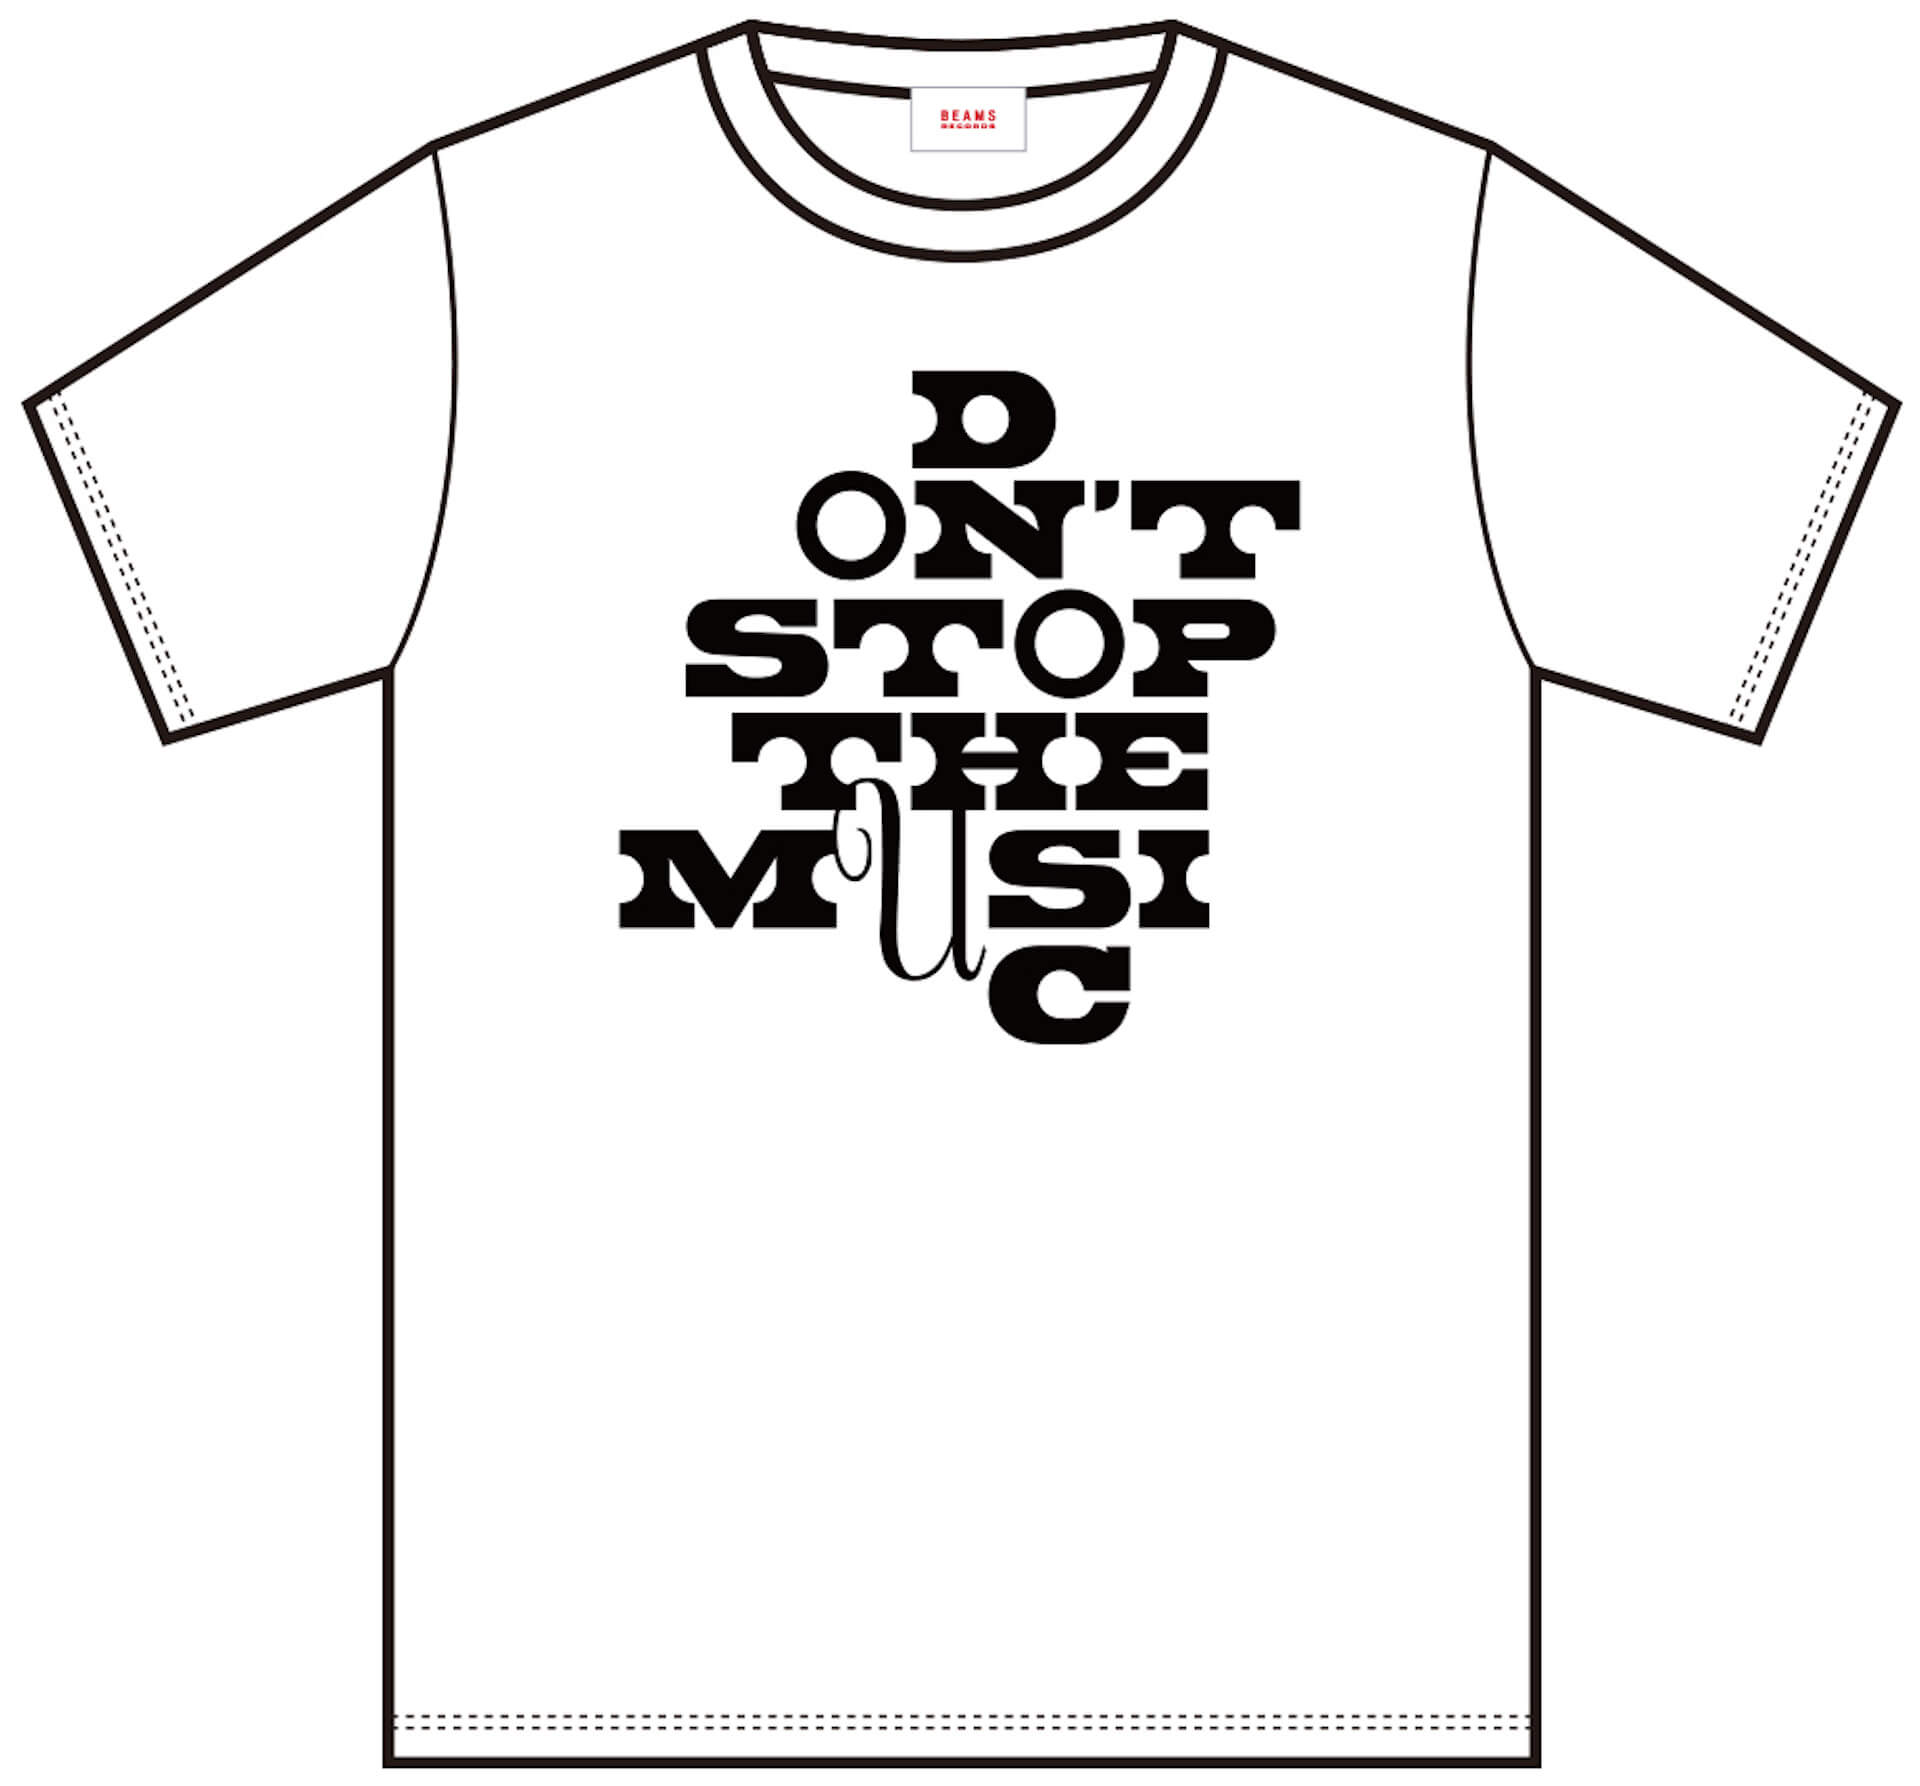 J-WAVE「#音楽を止めるな」BEAMS RECORDS協力のもと、ライブハウスを支援するオリジナルTシャツが受注販売開始! lf200515_jwave_beamsrecords_tshirts_07